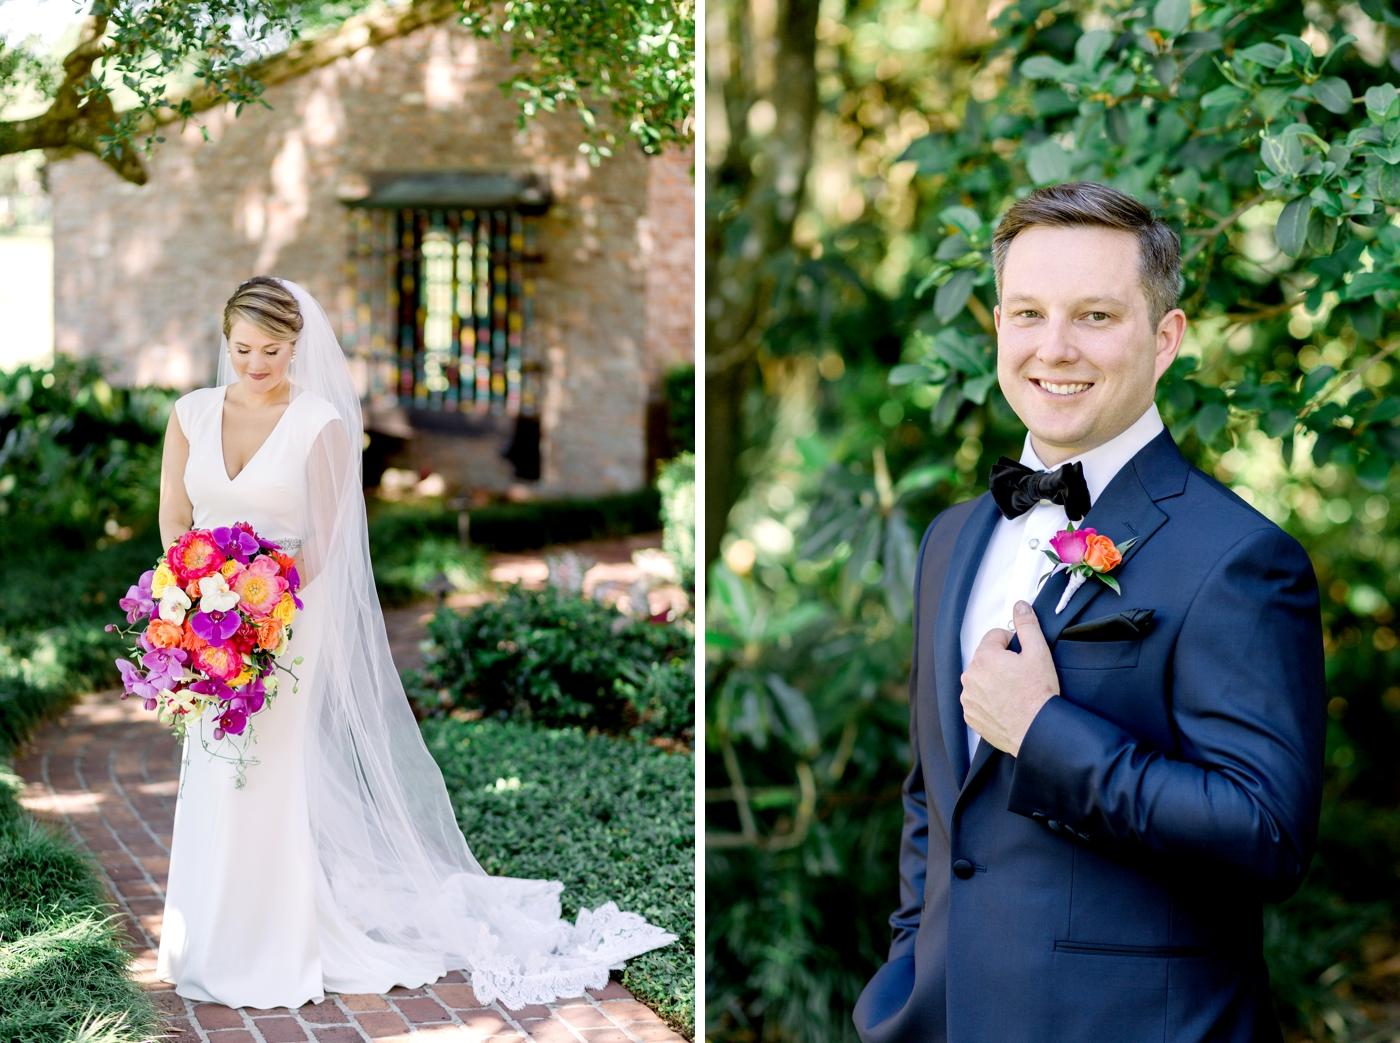 Bagdley Mischka bridal gown